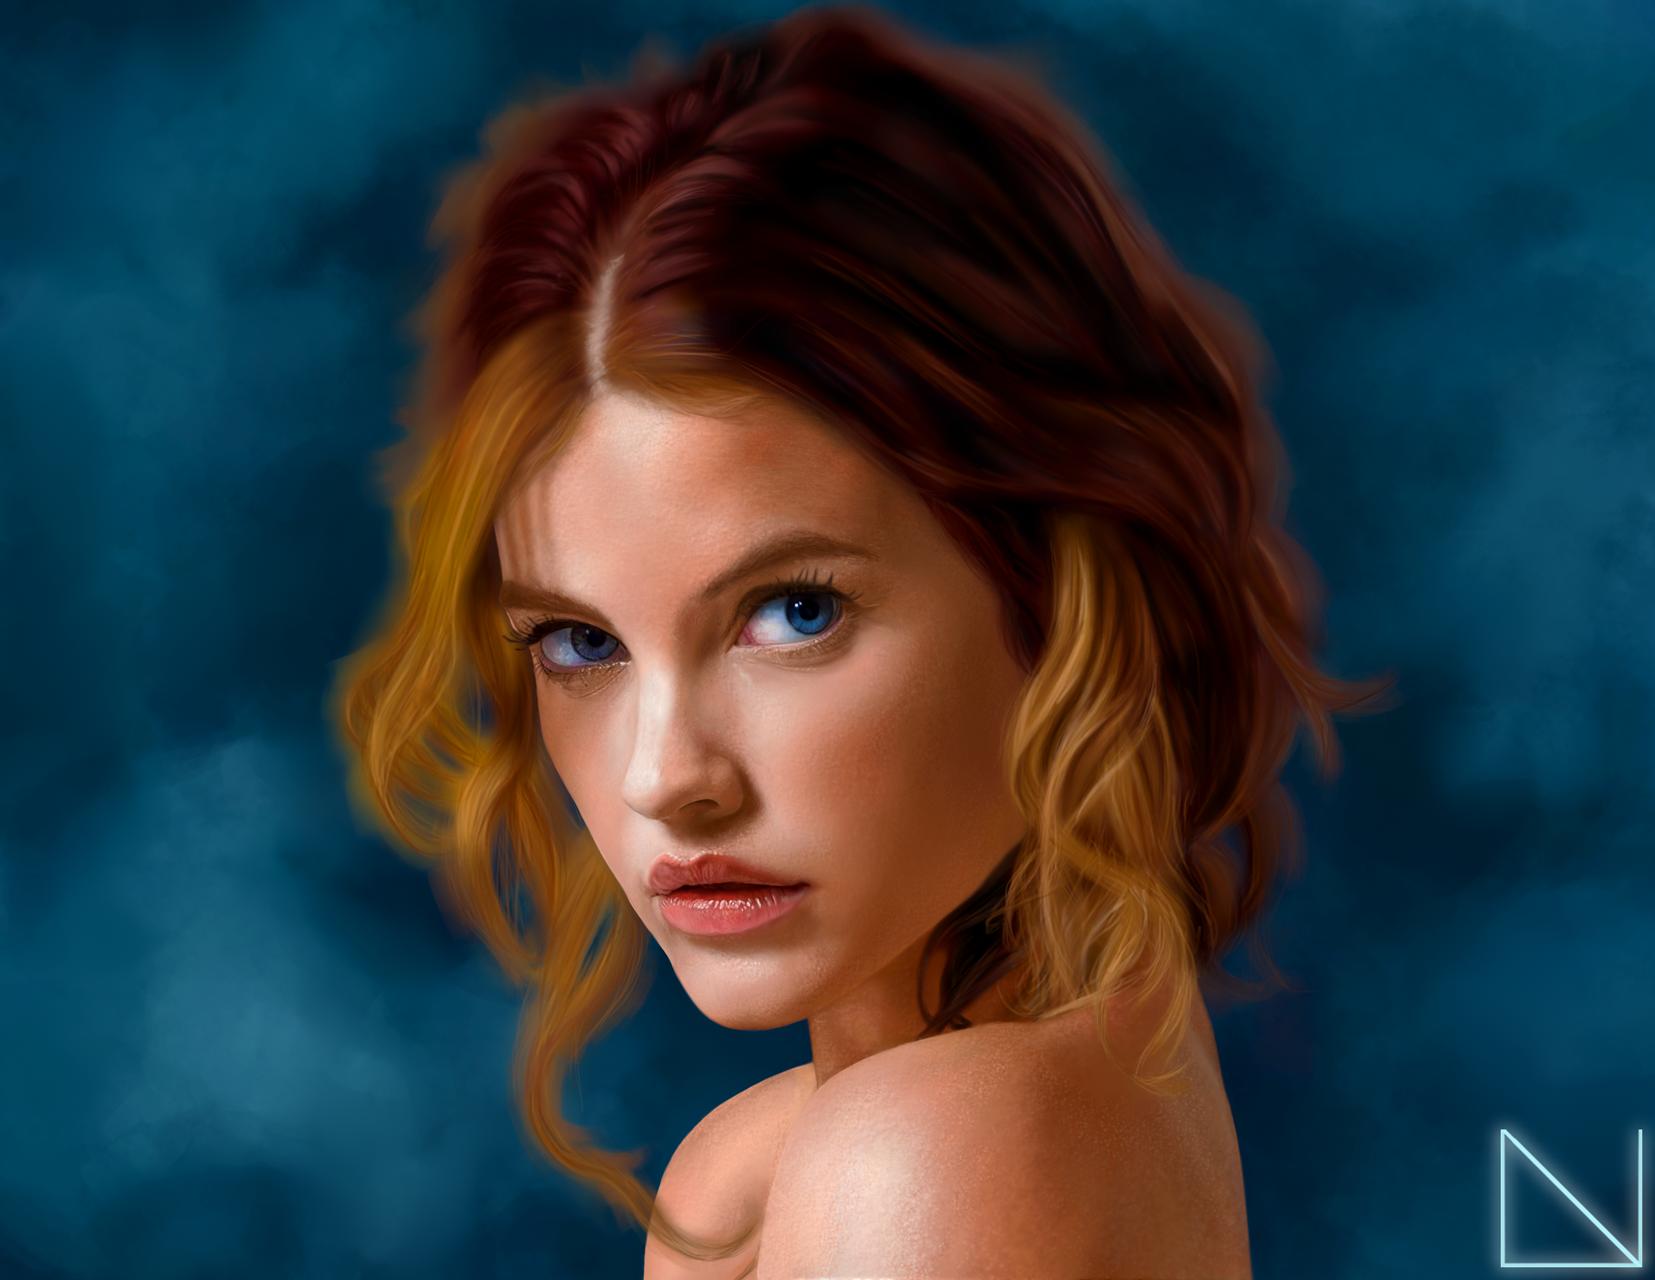 Portrait of Barbara Palvin